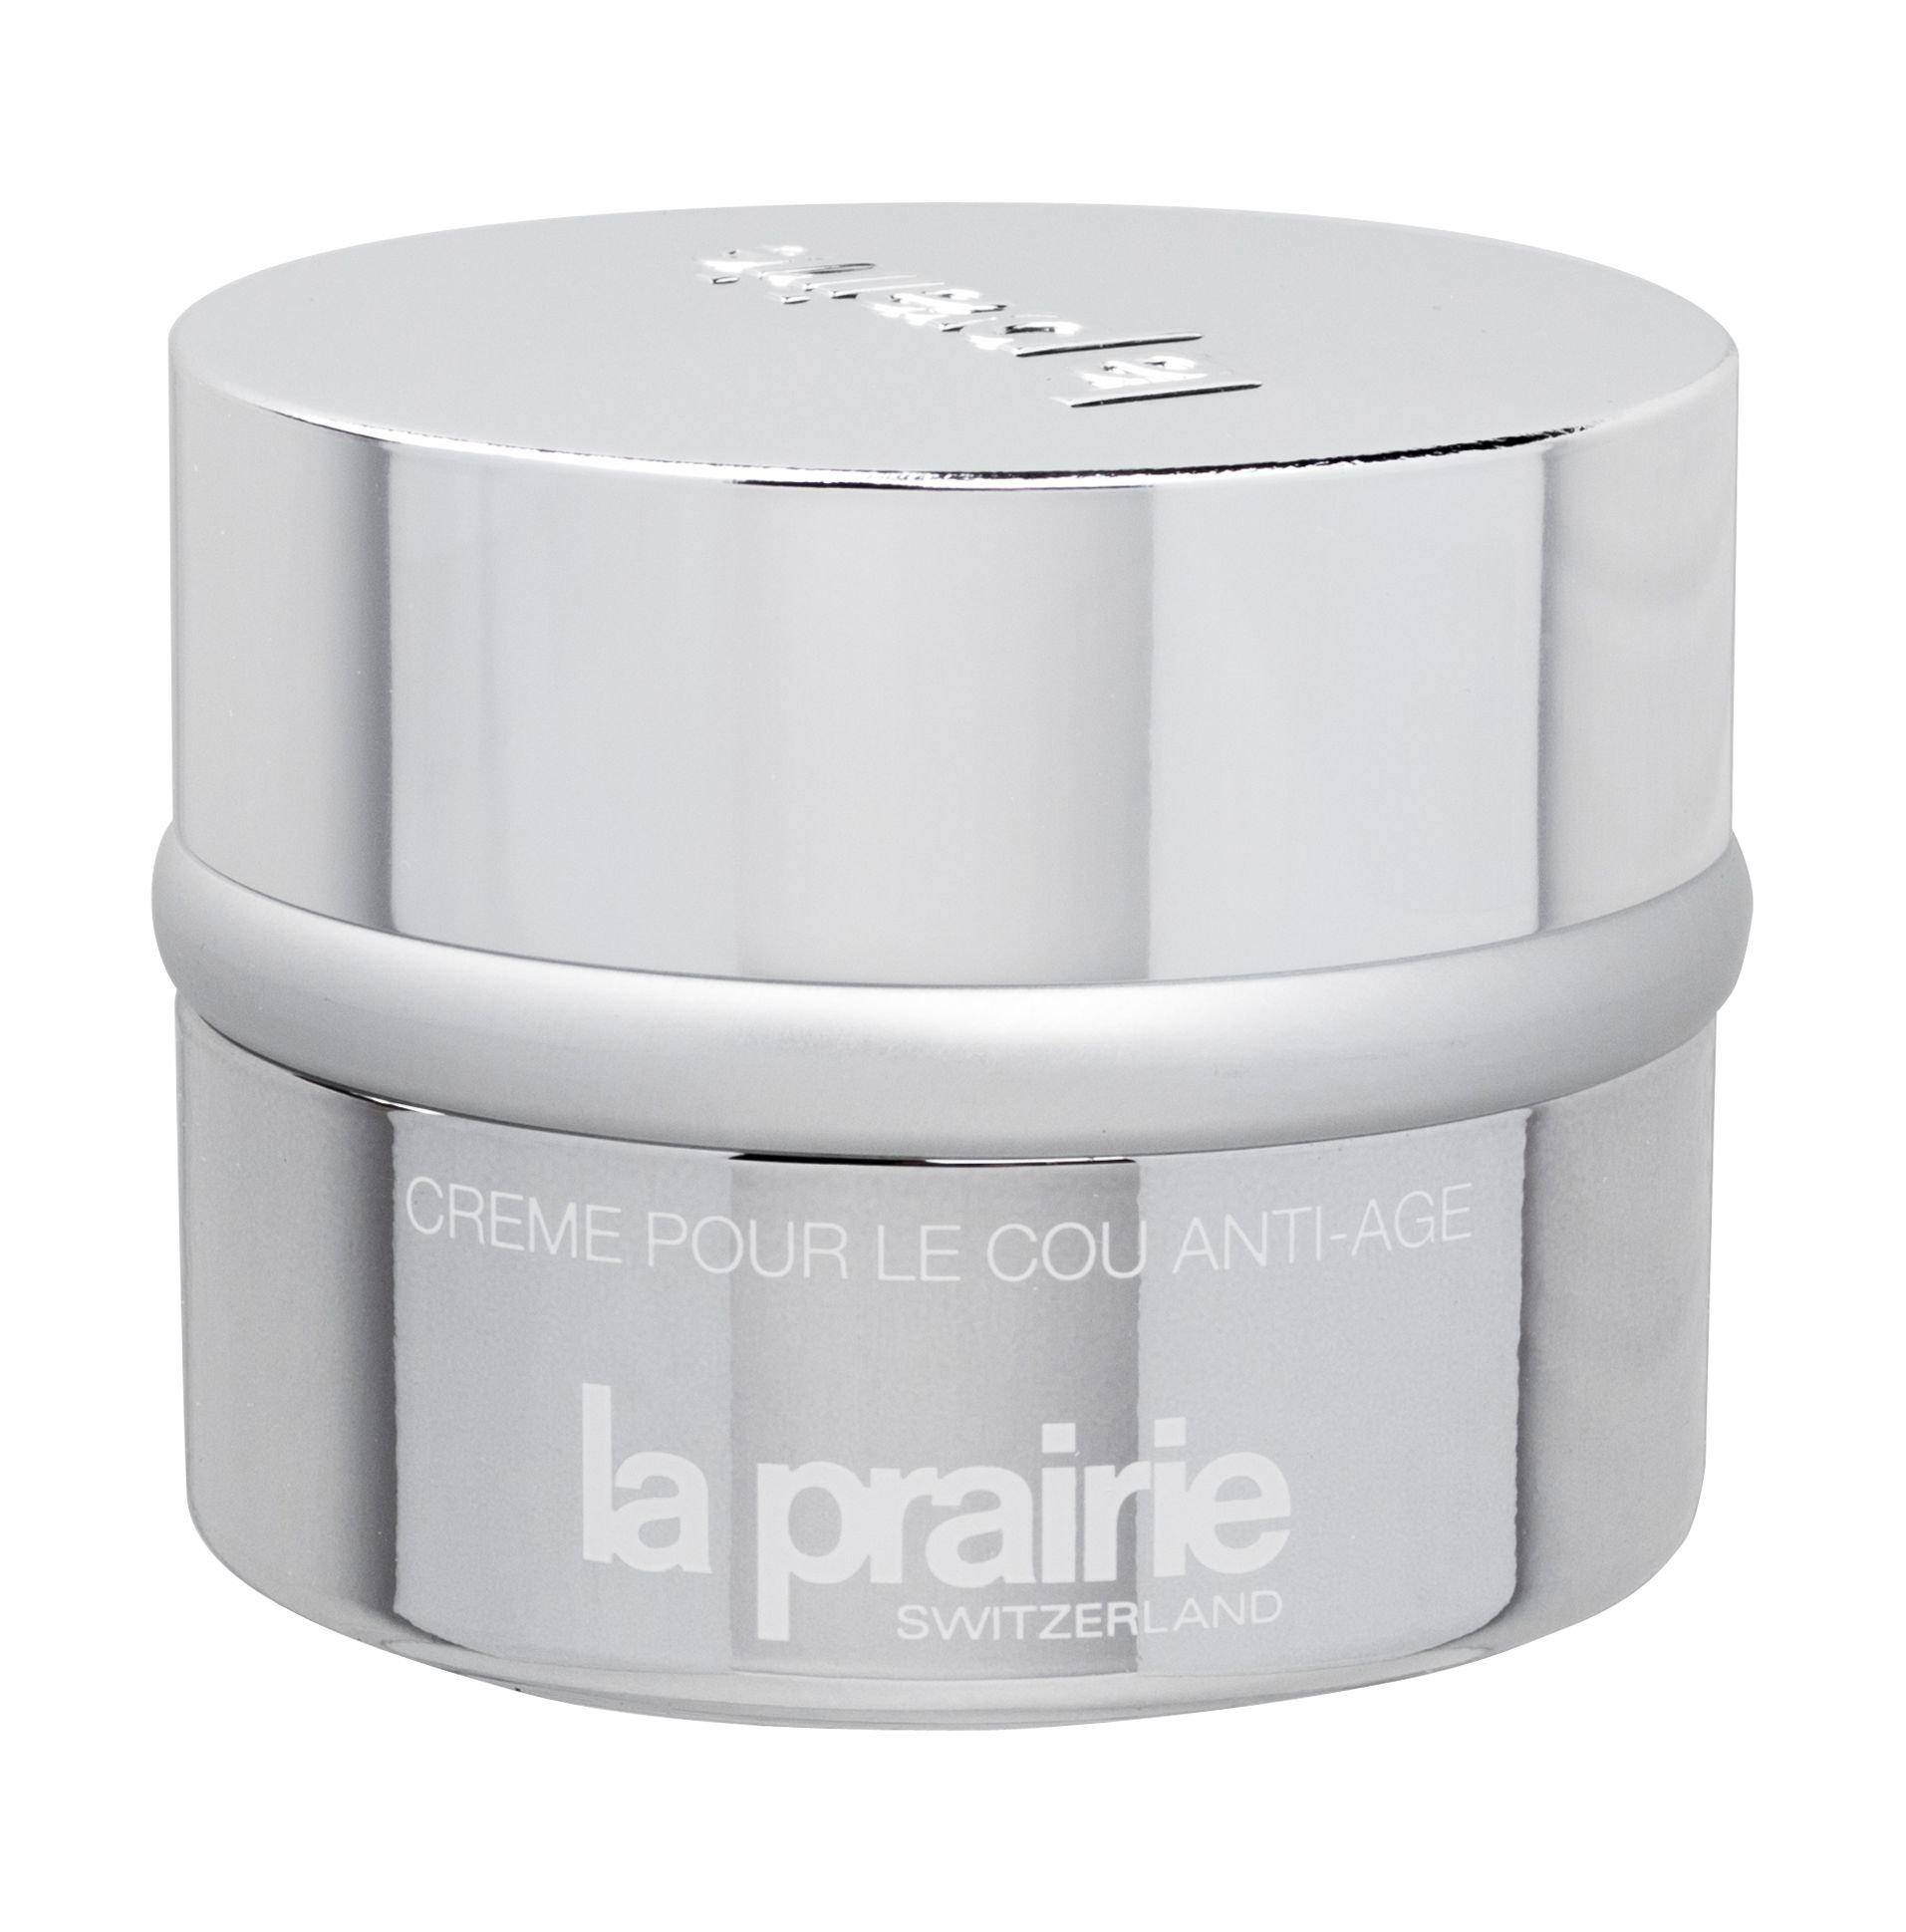 La Prairie Anti Aging Neck Cream Cosmetic 50ml